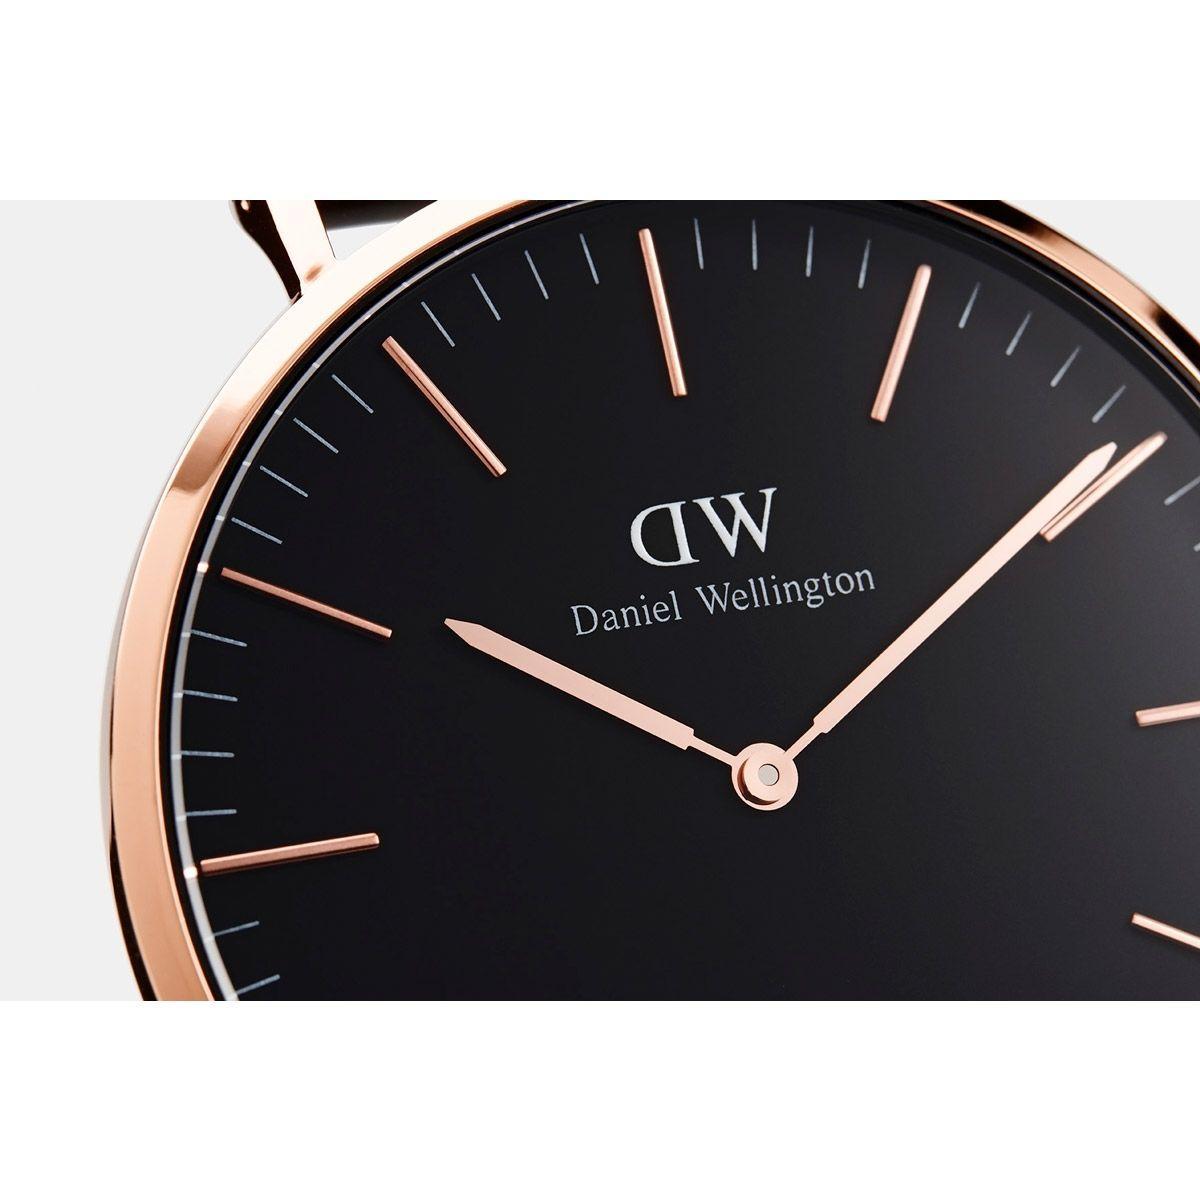 dw官网 dw手表官网 dw中国官网 dw官方旗舰店 DW DW官网  W Classic Black Cornwall RG 40mm